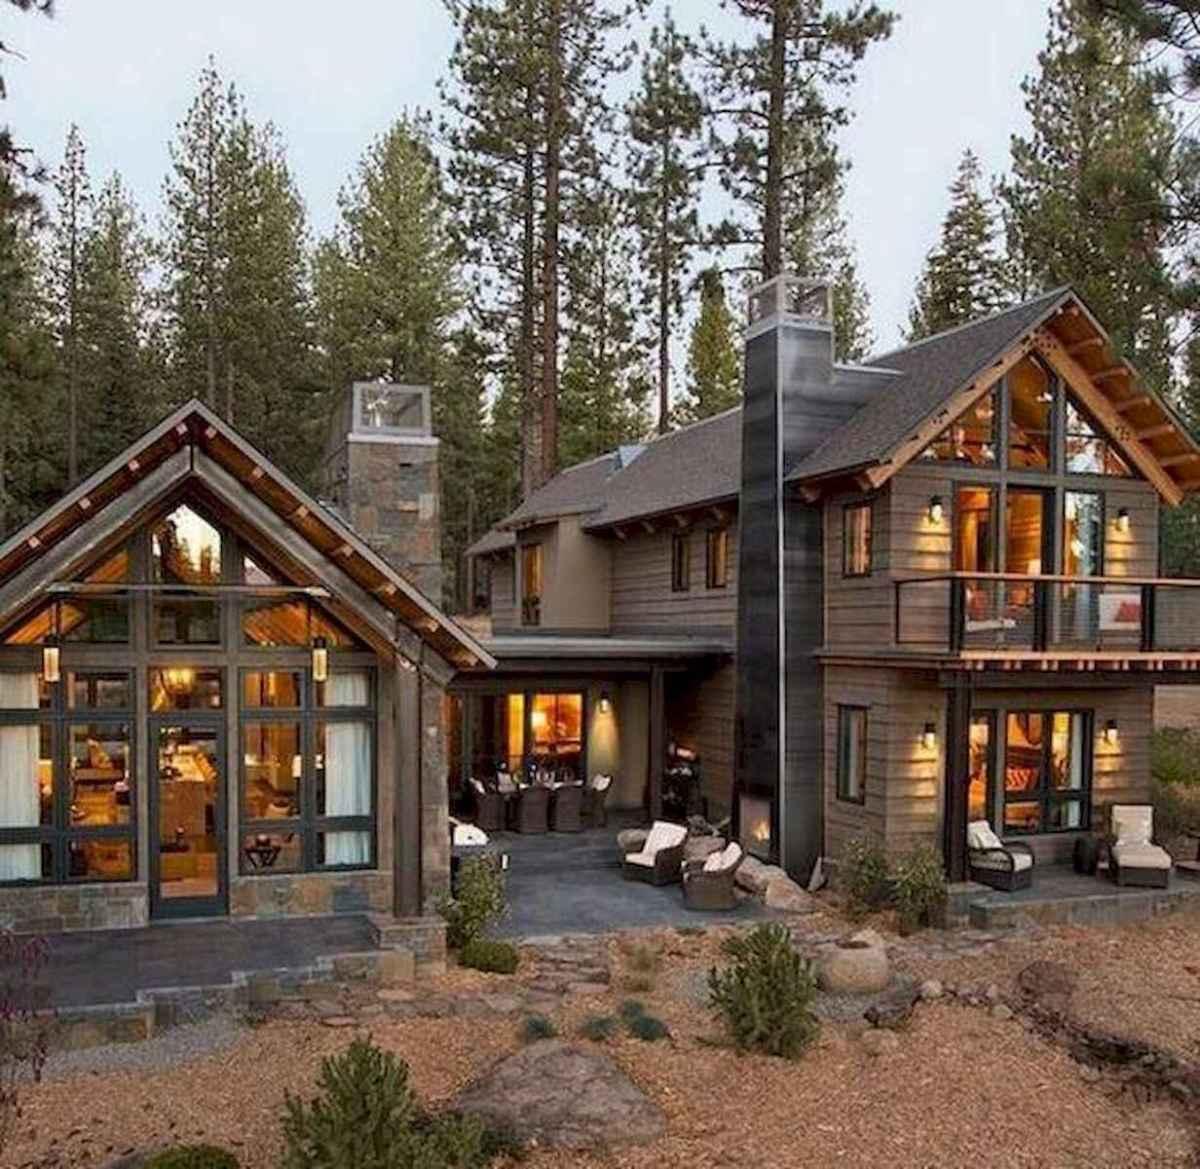 75 Great Log Cabin Homes Plans Design Ideas (59)